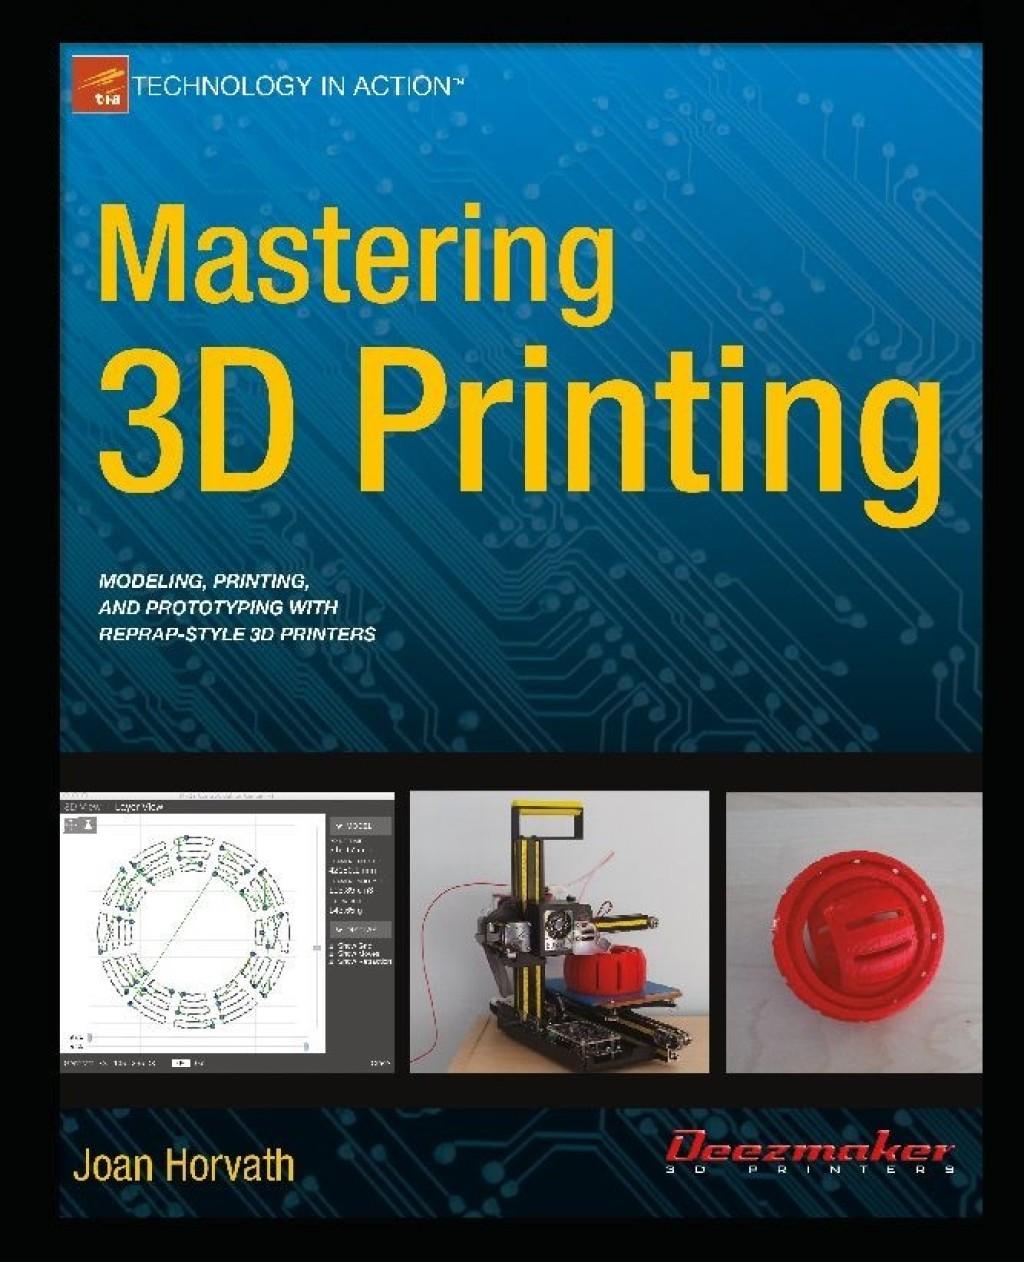 Mastering 3D Printing (eBook) (9781484200254) photo